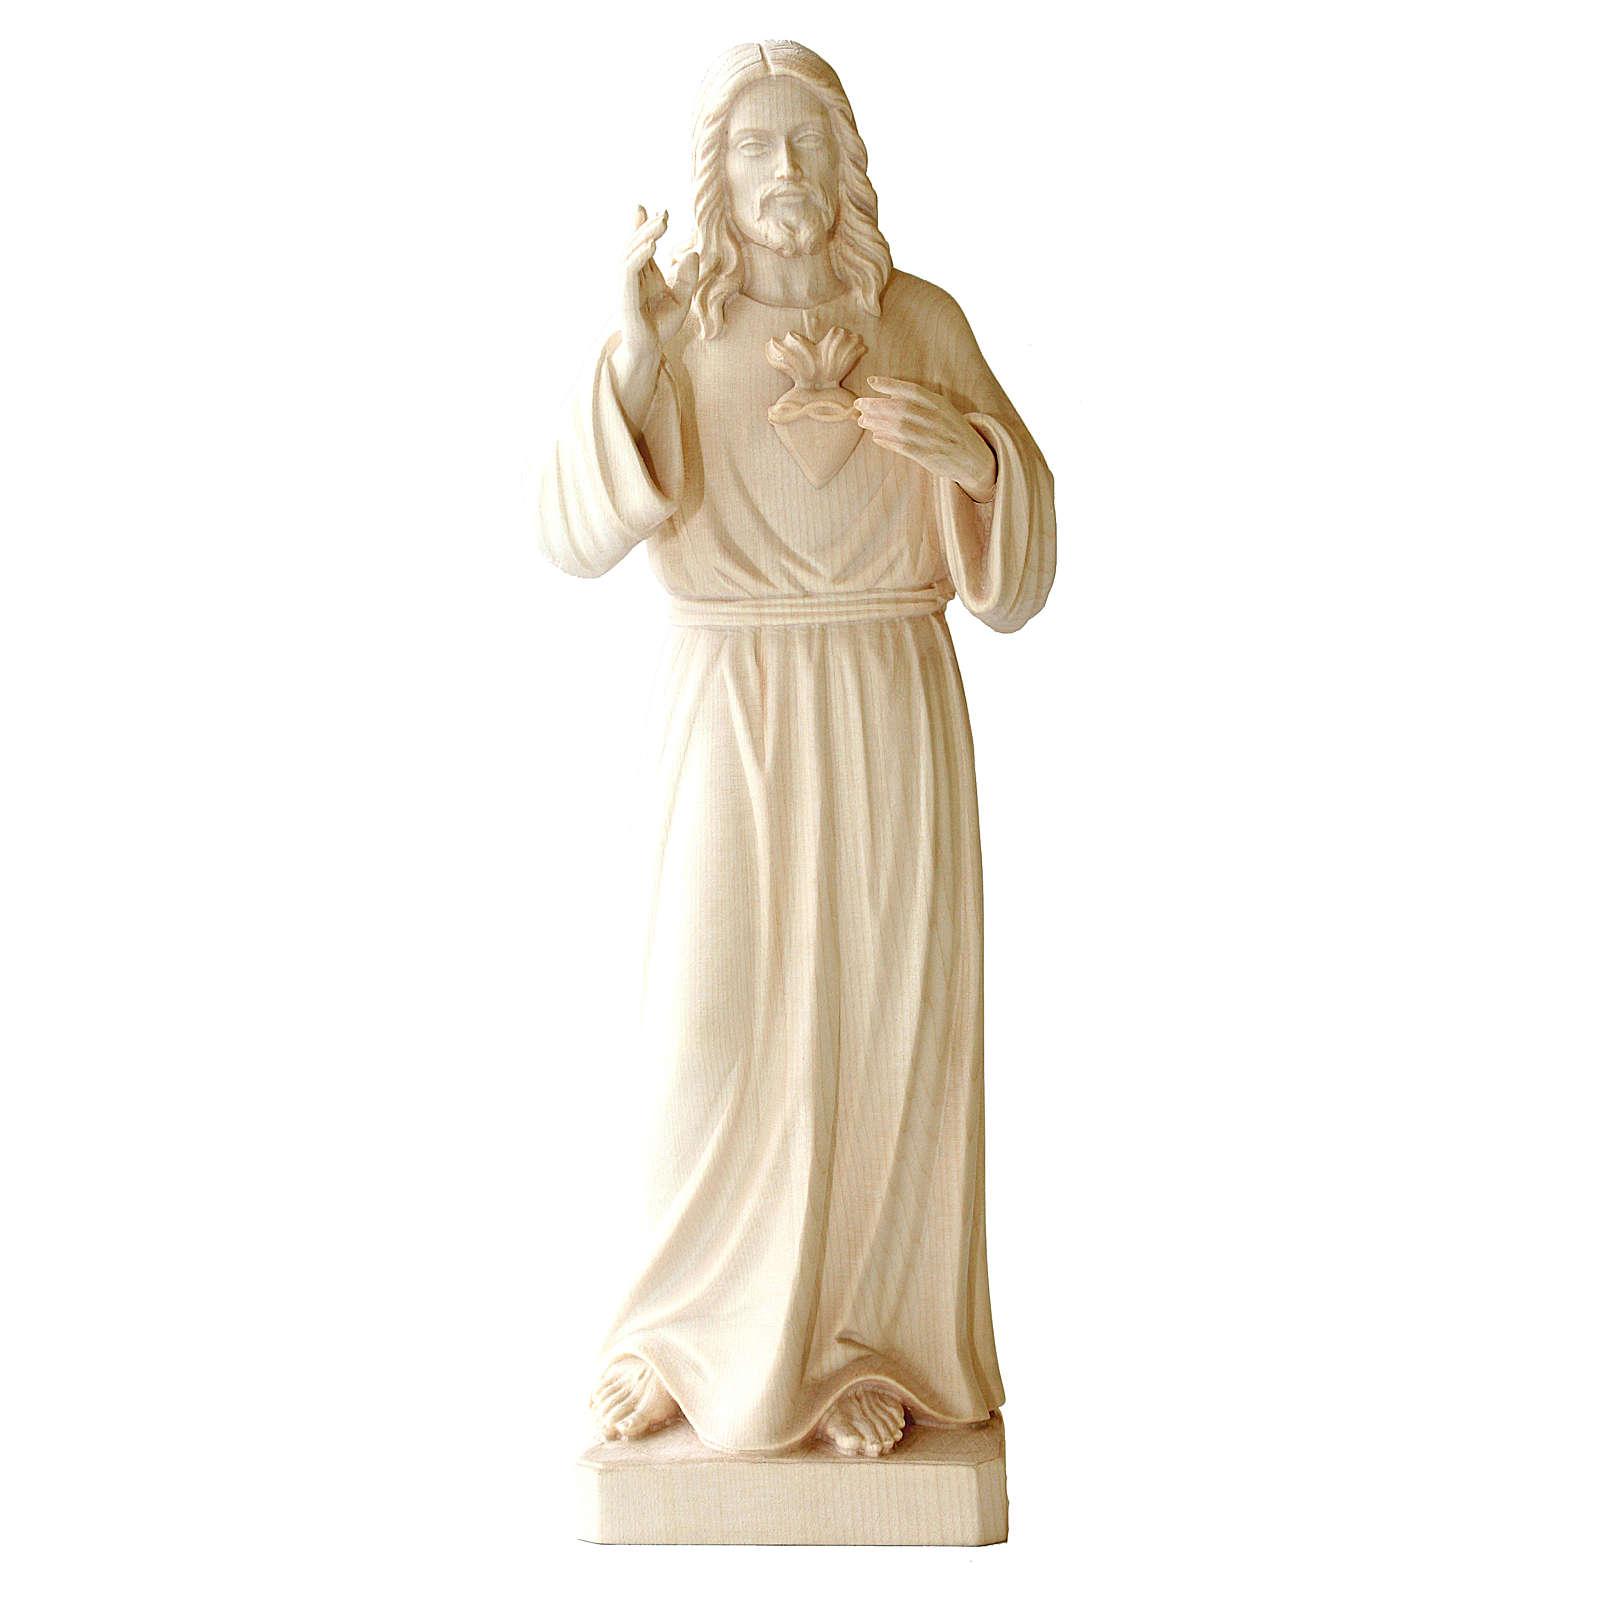 Statua in legno naturale Val Gardena Sacro Cuore di Gesù 4